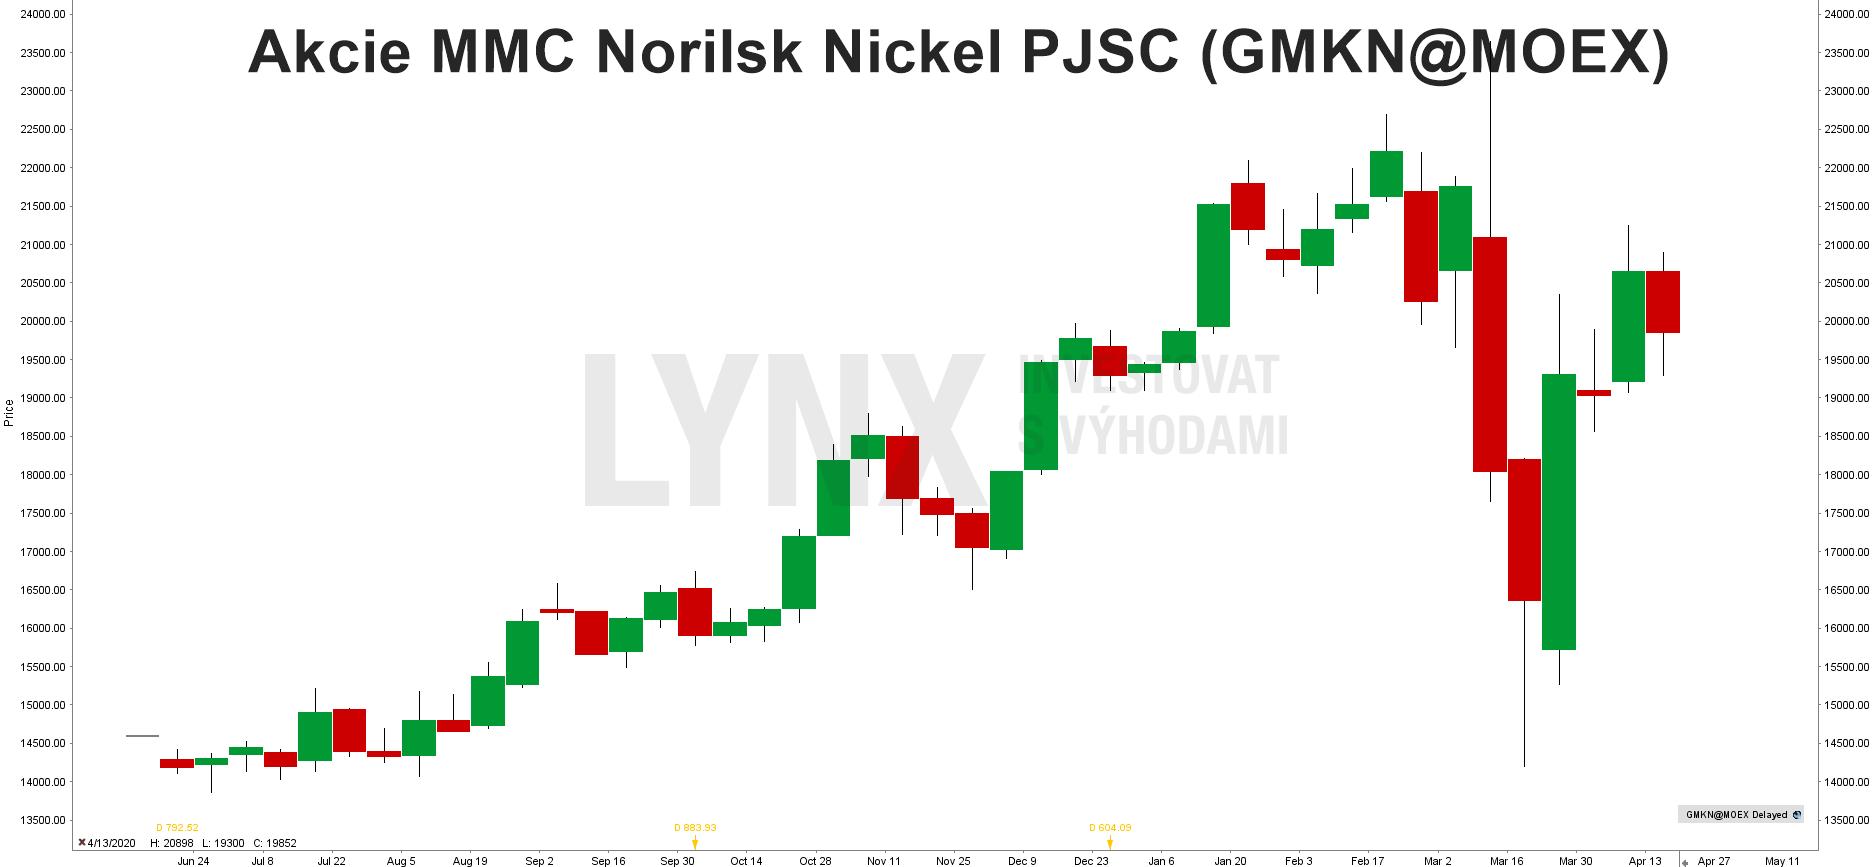 akcie Norilsk Nickel (GMKN)